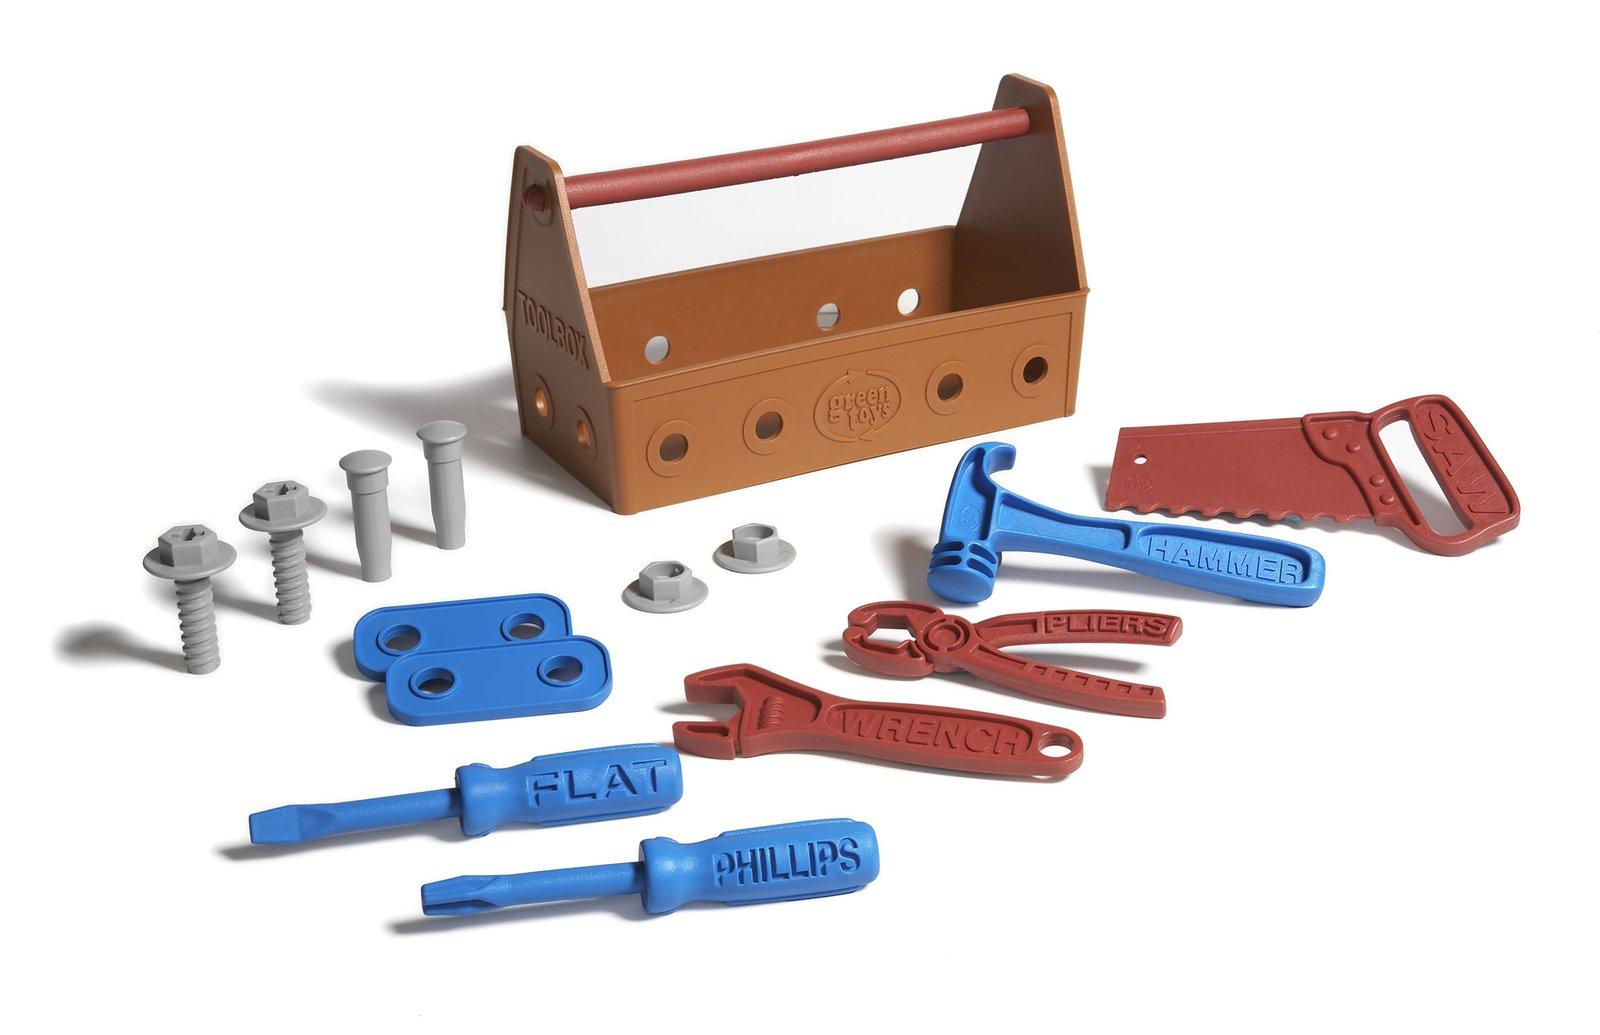 Toy Tool Kits For Boys : Green toys tool set